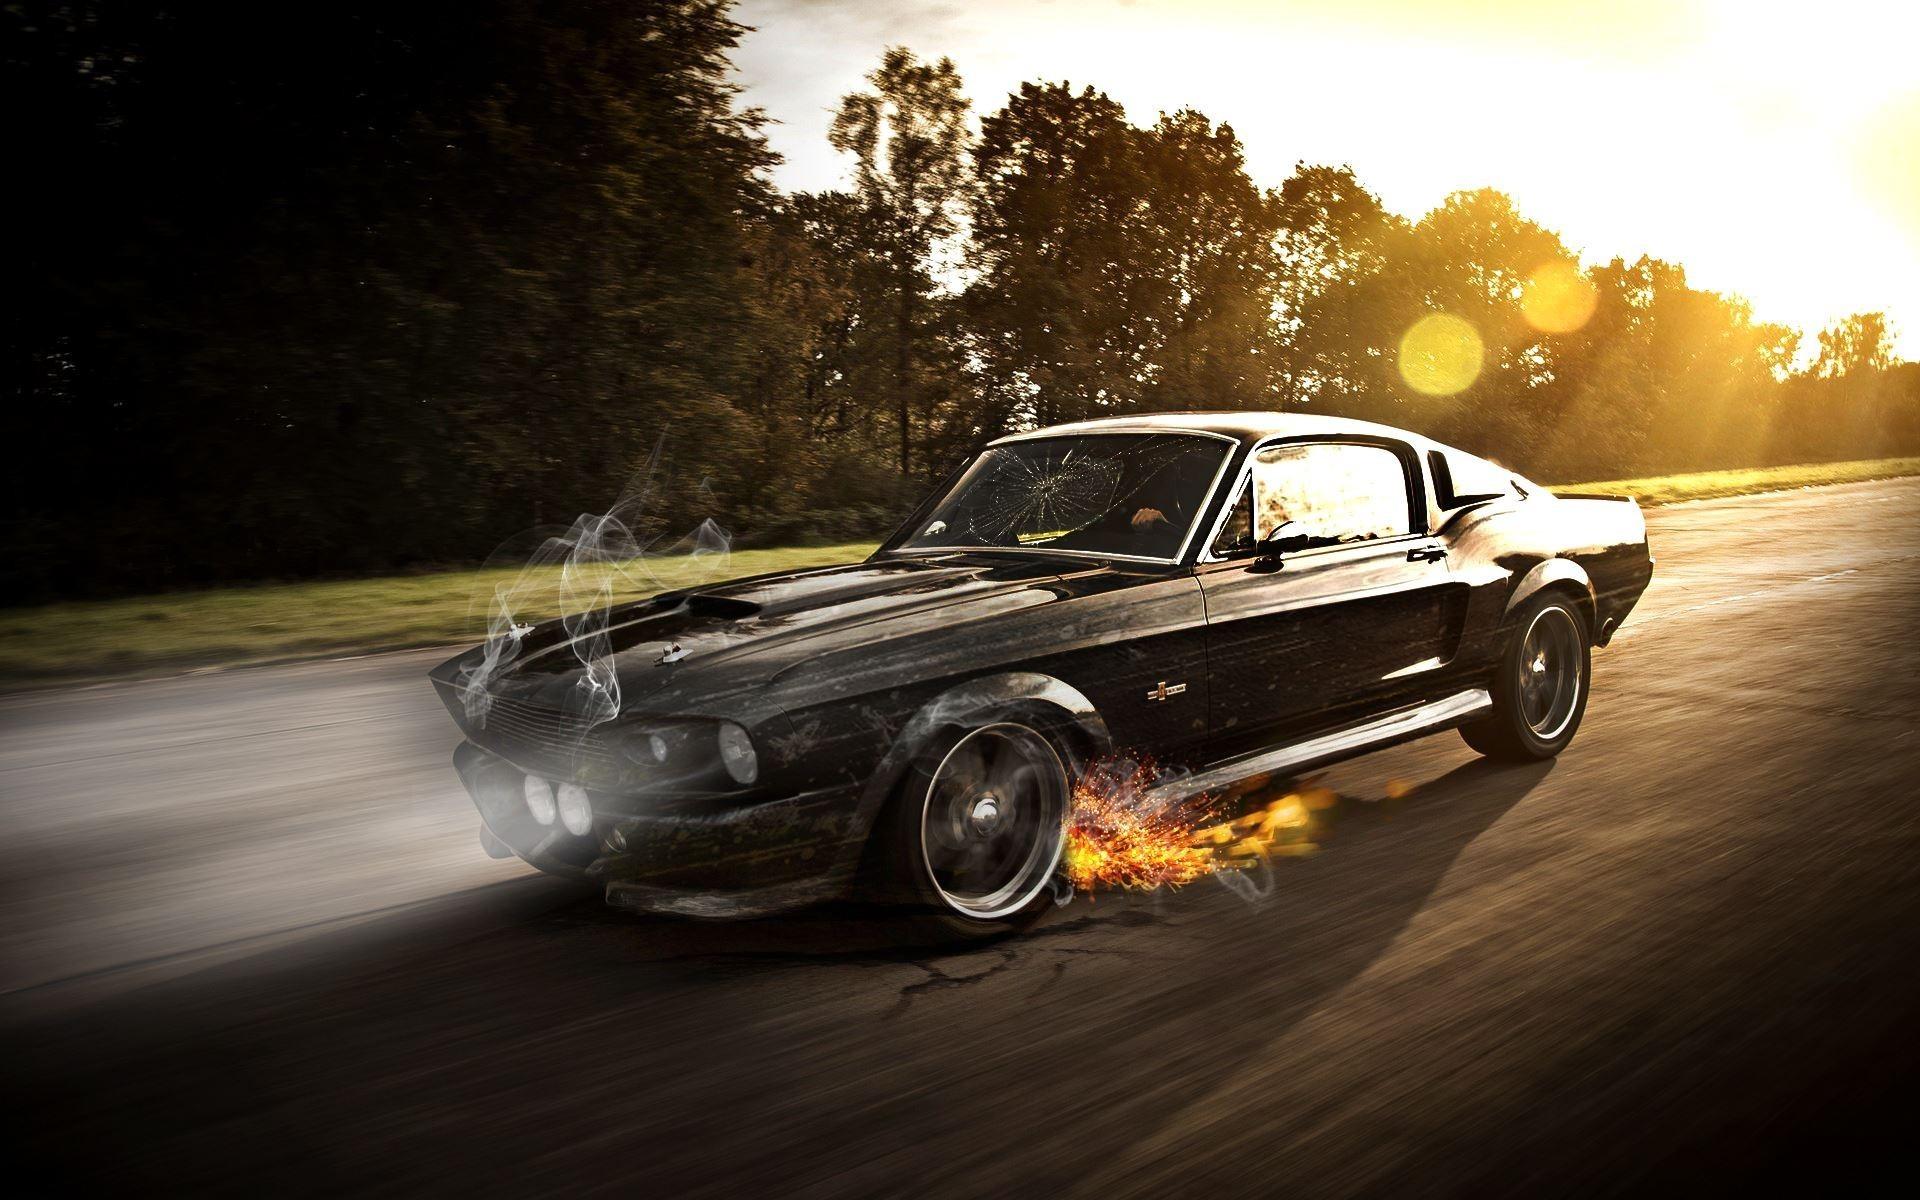 Car Ford Mustang Muscle Cars Eleanor Car Wallpaper Hd